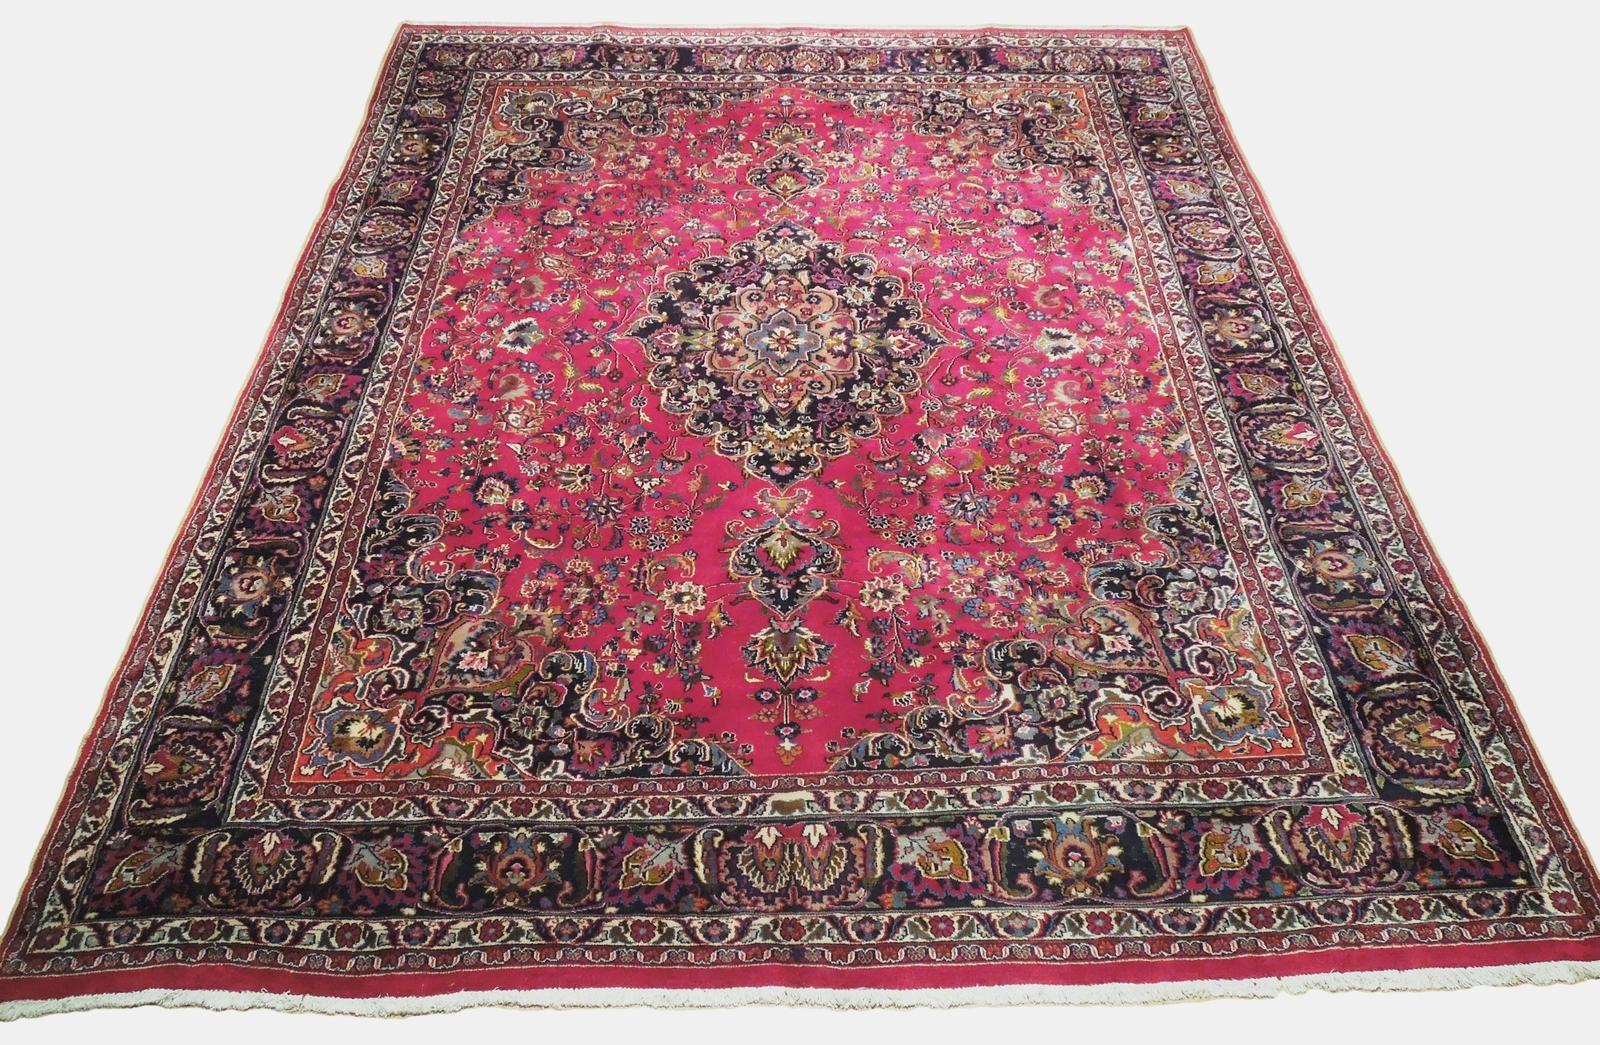 Red Wool Rug 10' x 12' Scarlet Vivid Original Traditional Persian Handmade Rug